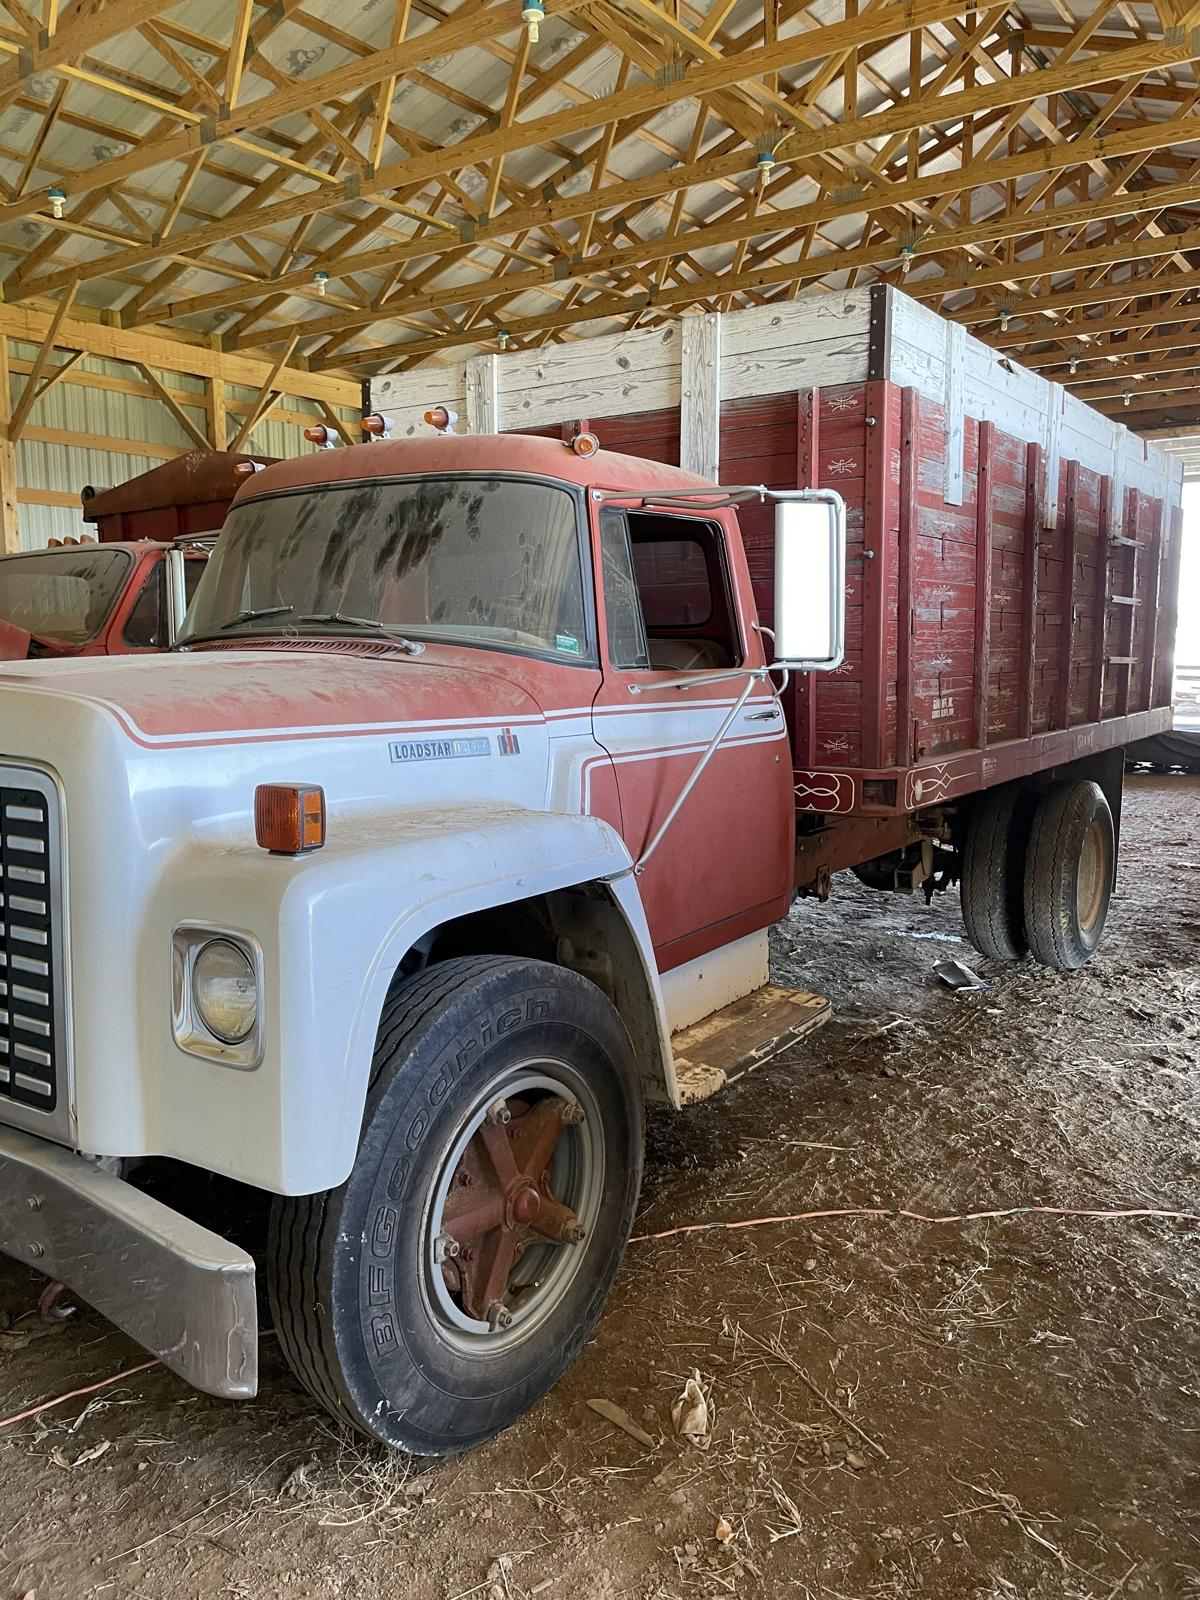 1977 International truck image 1